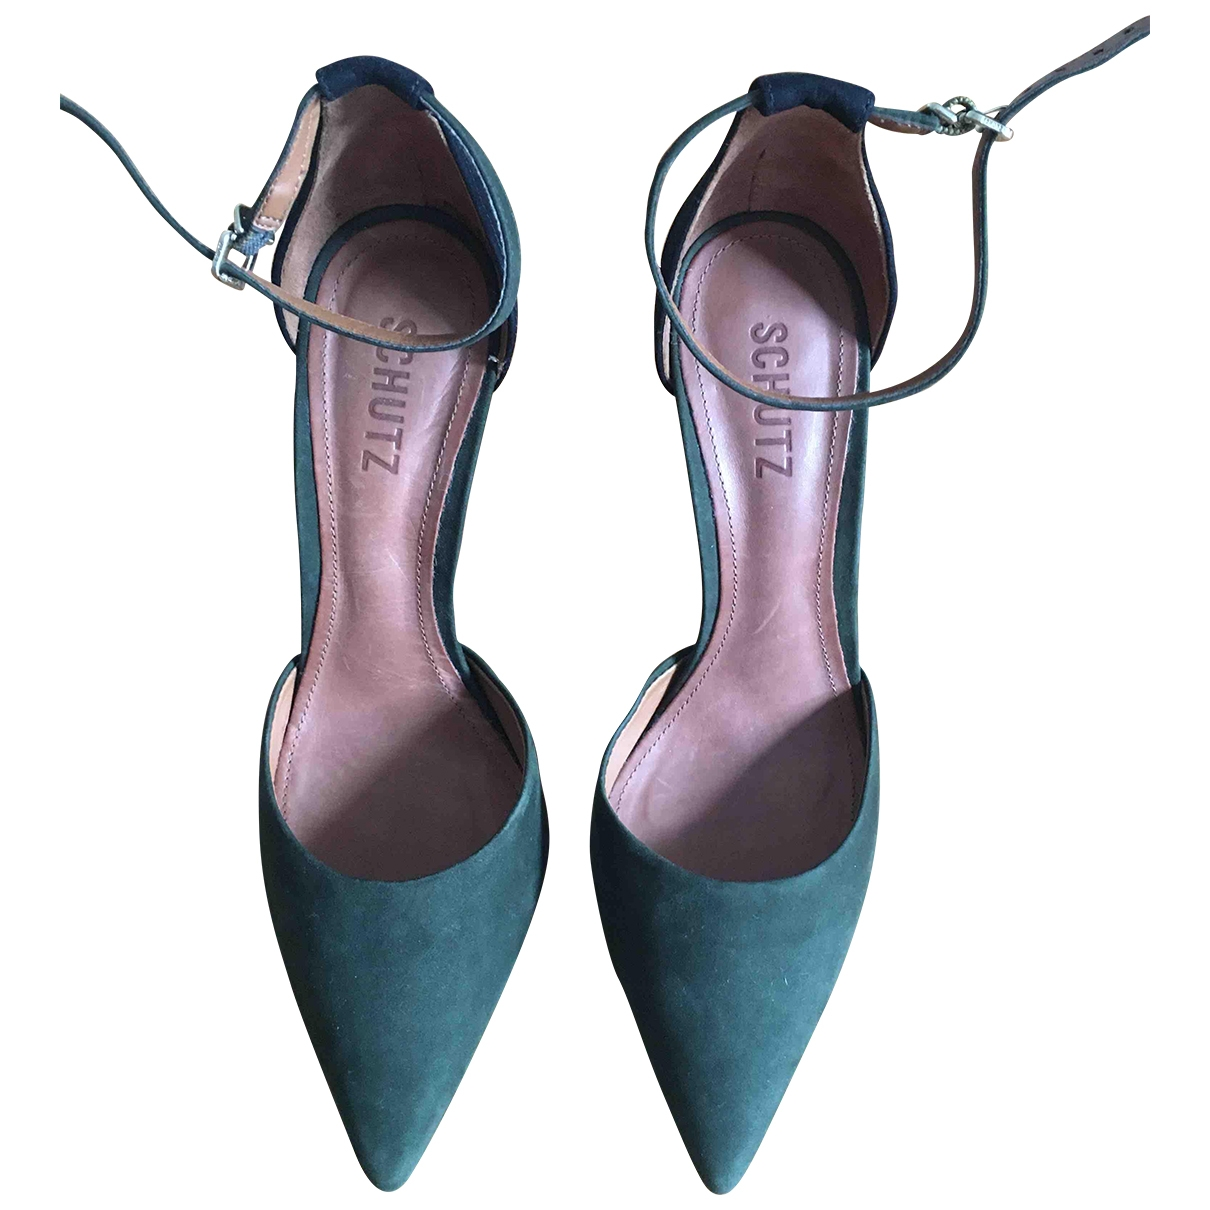 Schutz - Escarpins   pour femme en cuir - vert